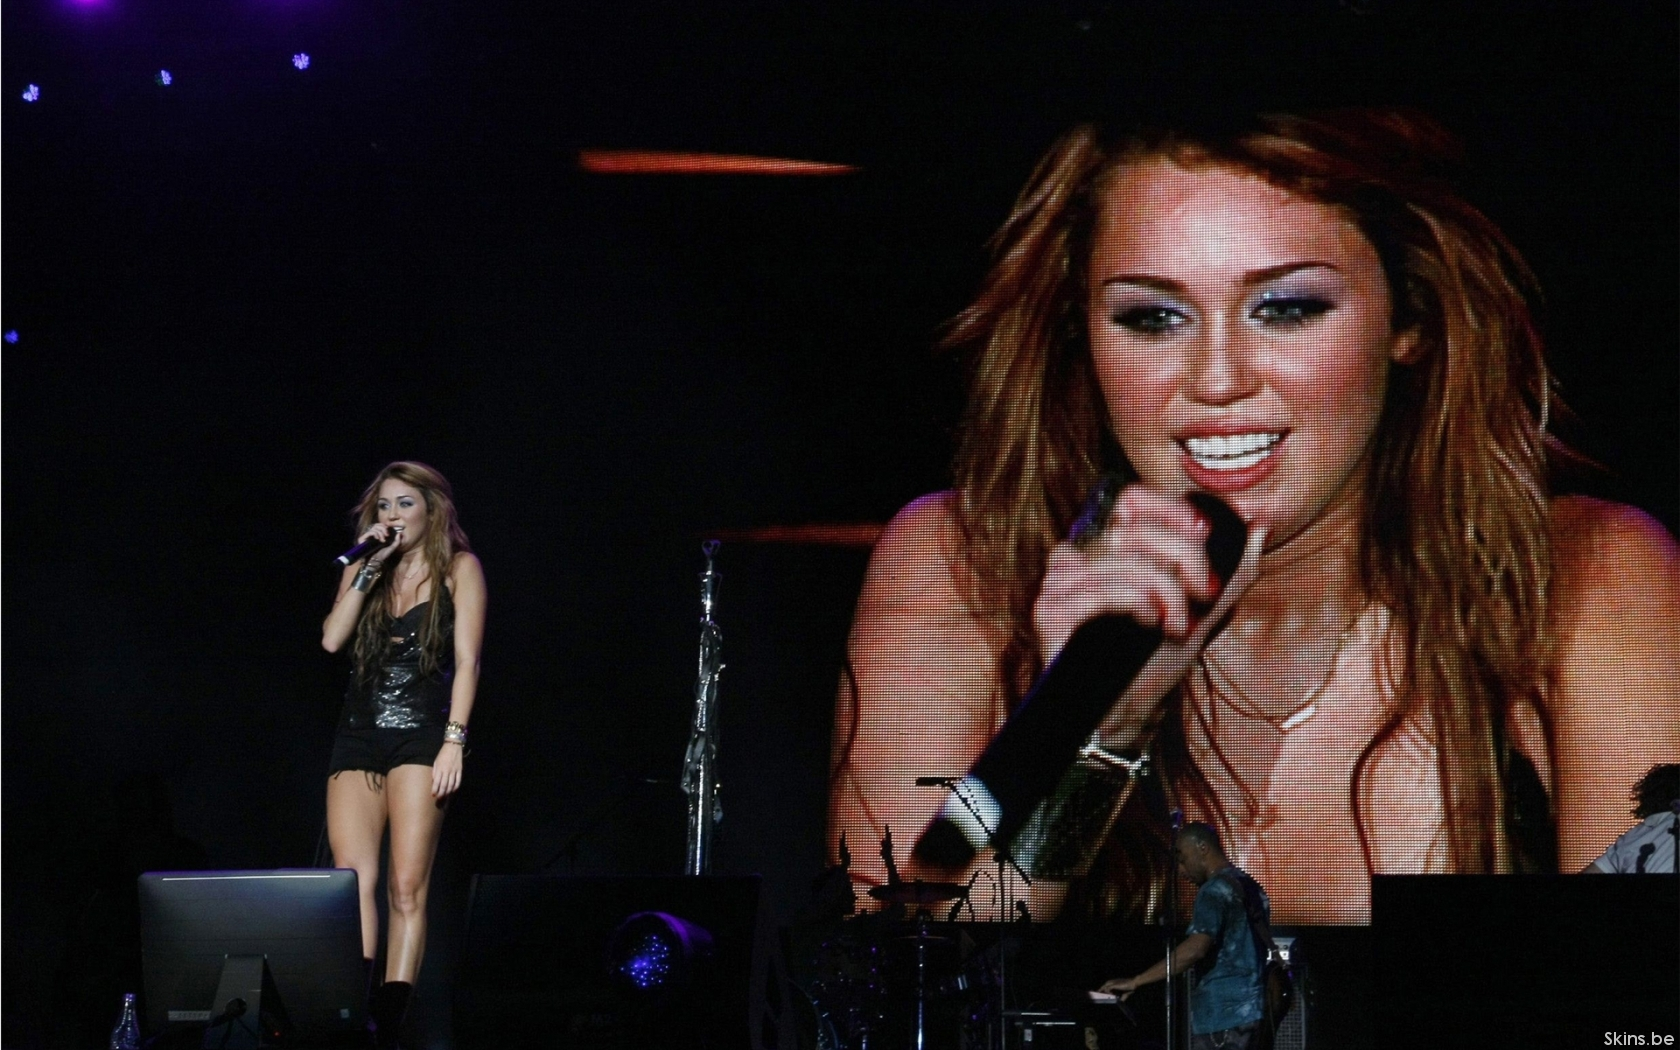 Miley Cyrus wallpaper (#38814)